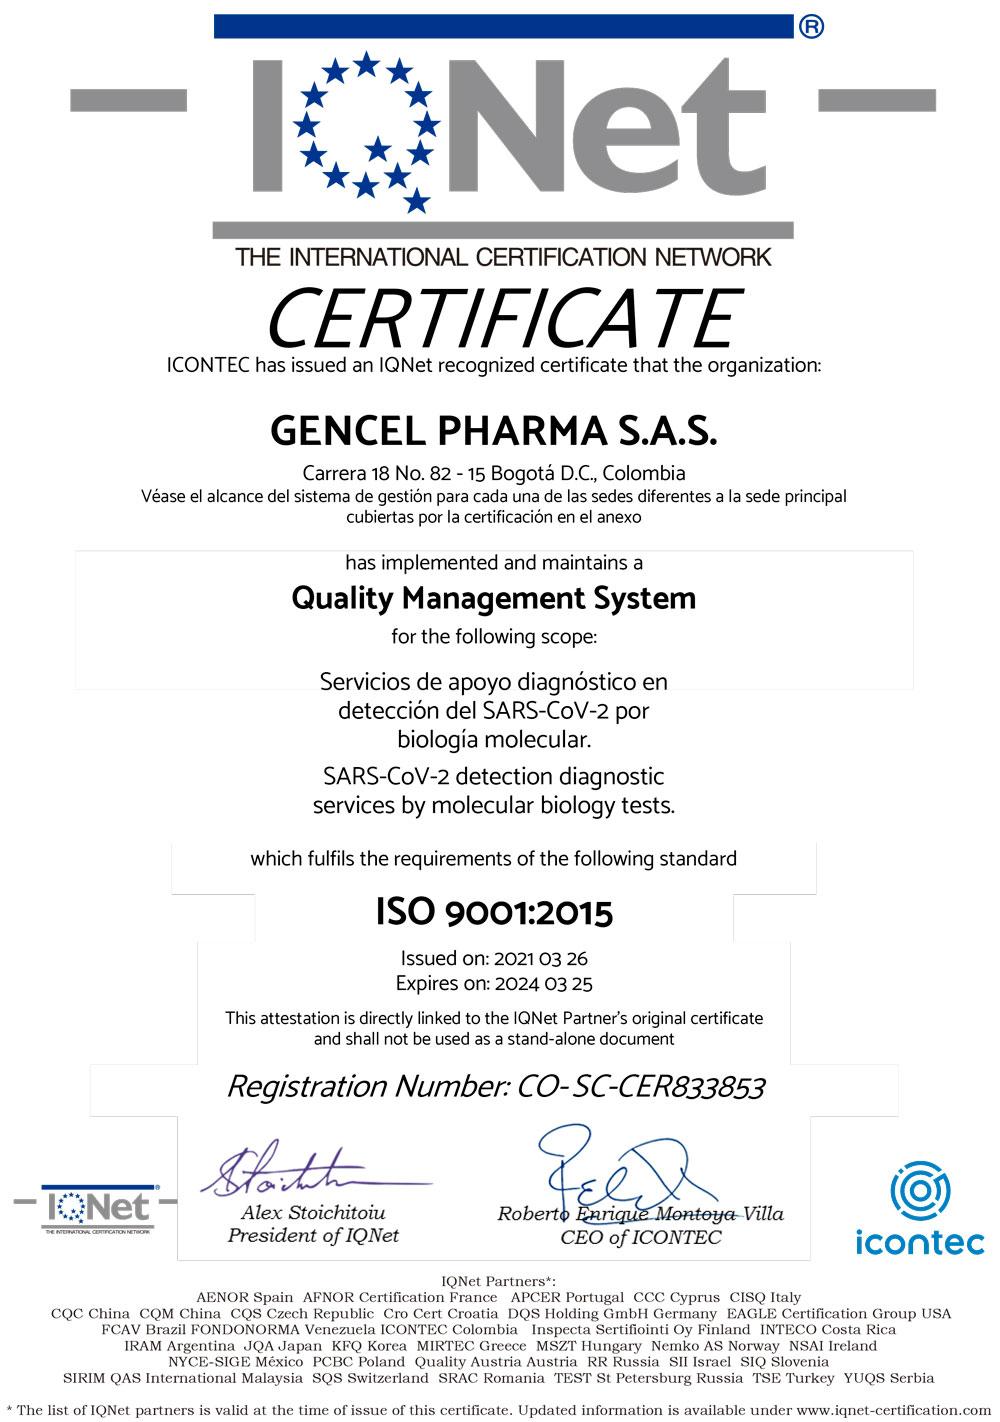 IQNET - Gencell Pharma